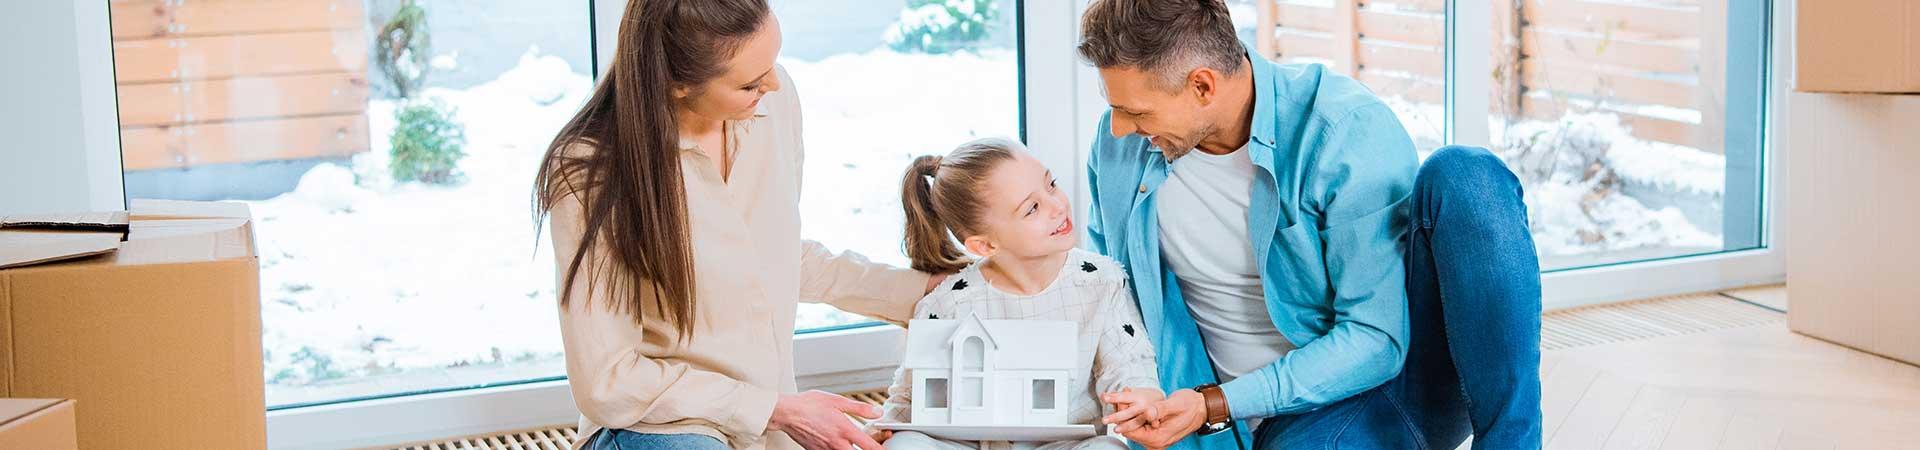 Life Insurance in Matthews, NC, Concord, NC, Charlotte, Gastonia